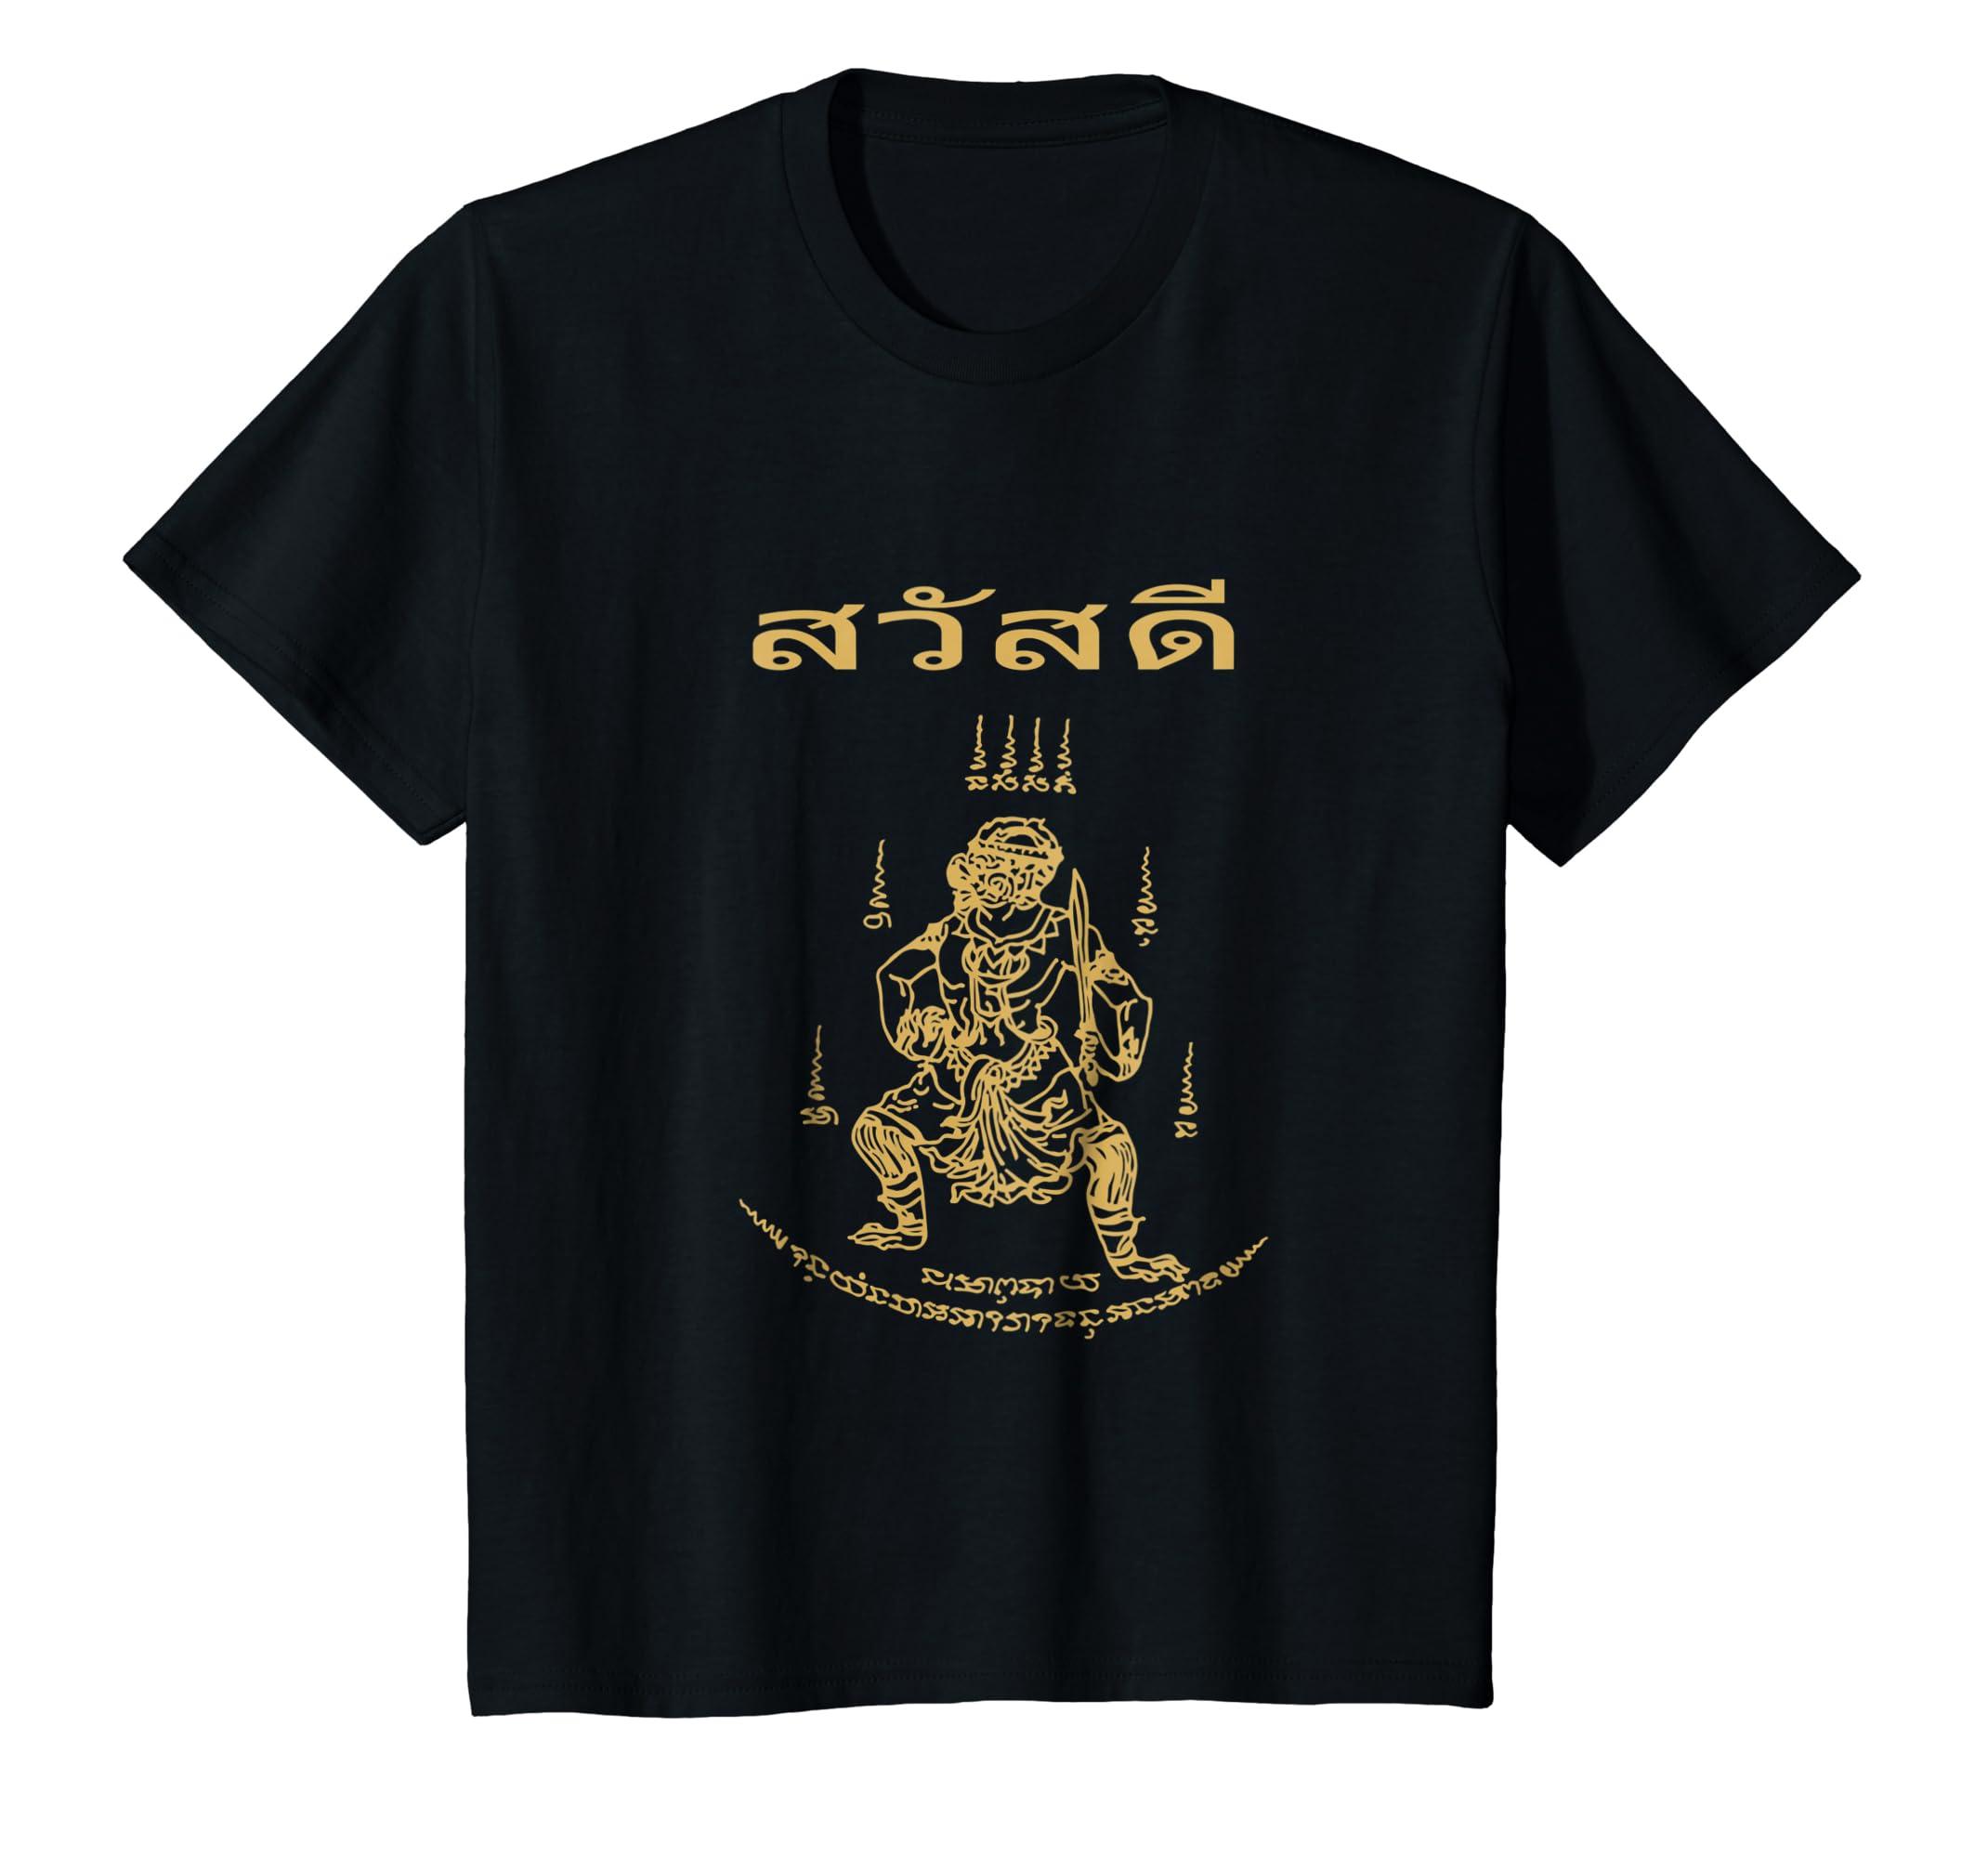 ec490d37 Amazon.com: Sak Yant Tattoo Thailand t shirt: Clothing